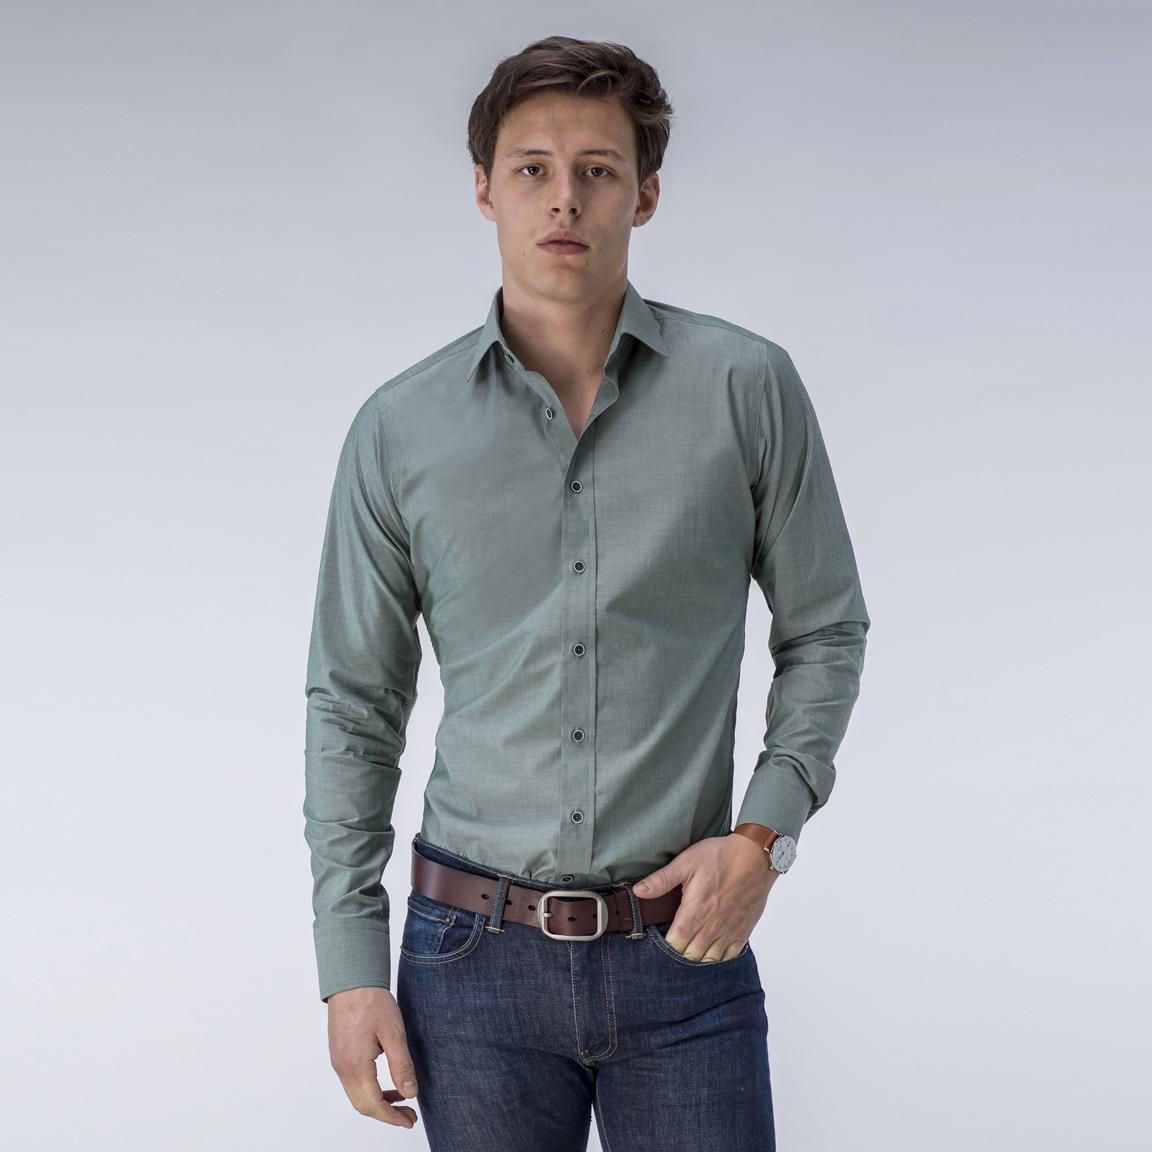 Donkergroen Overhemd.Donkergroen Overhemd Tailor Store